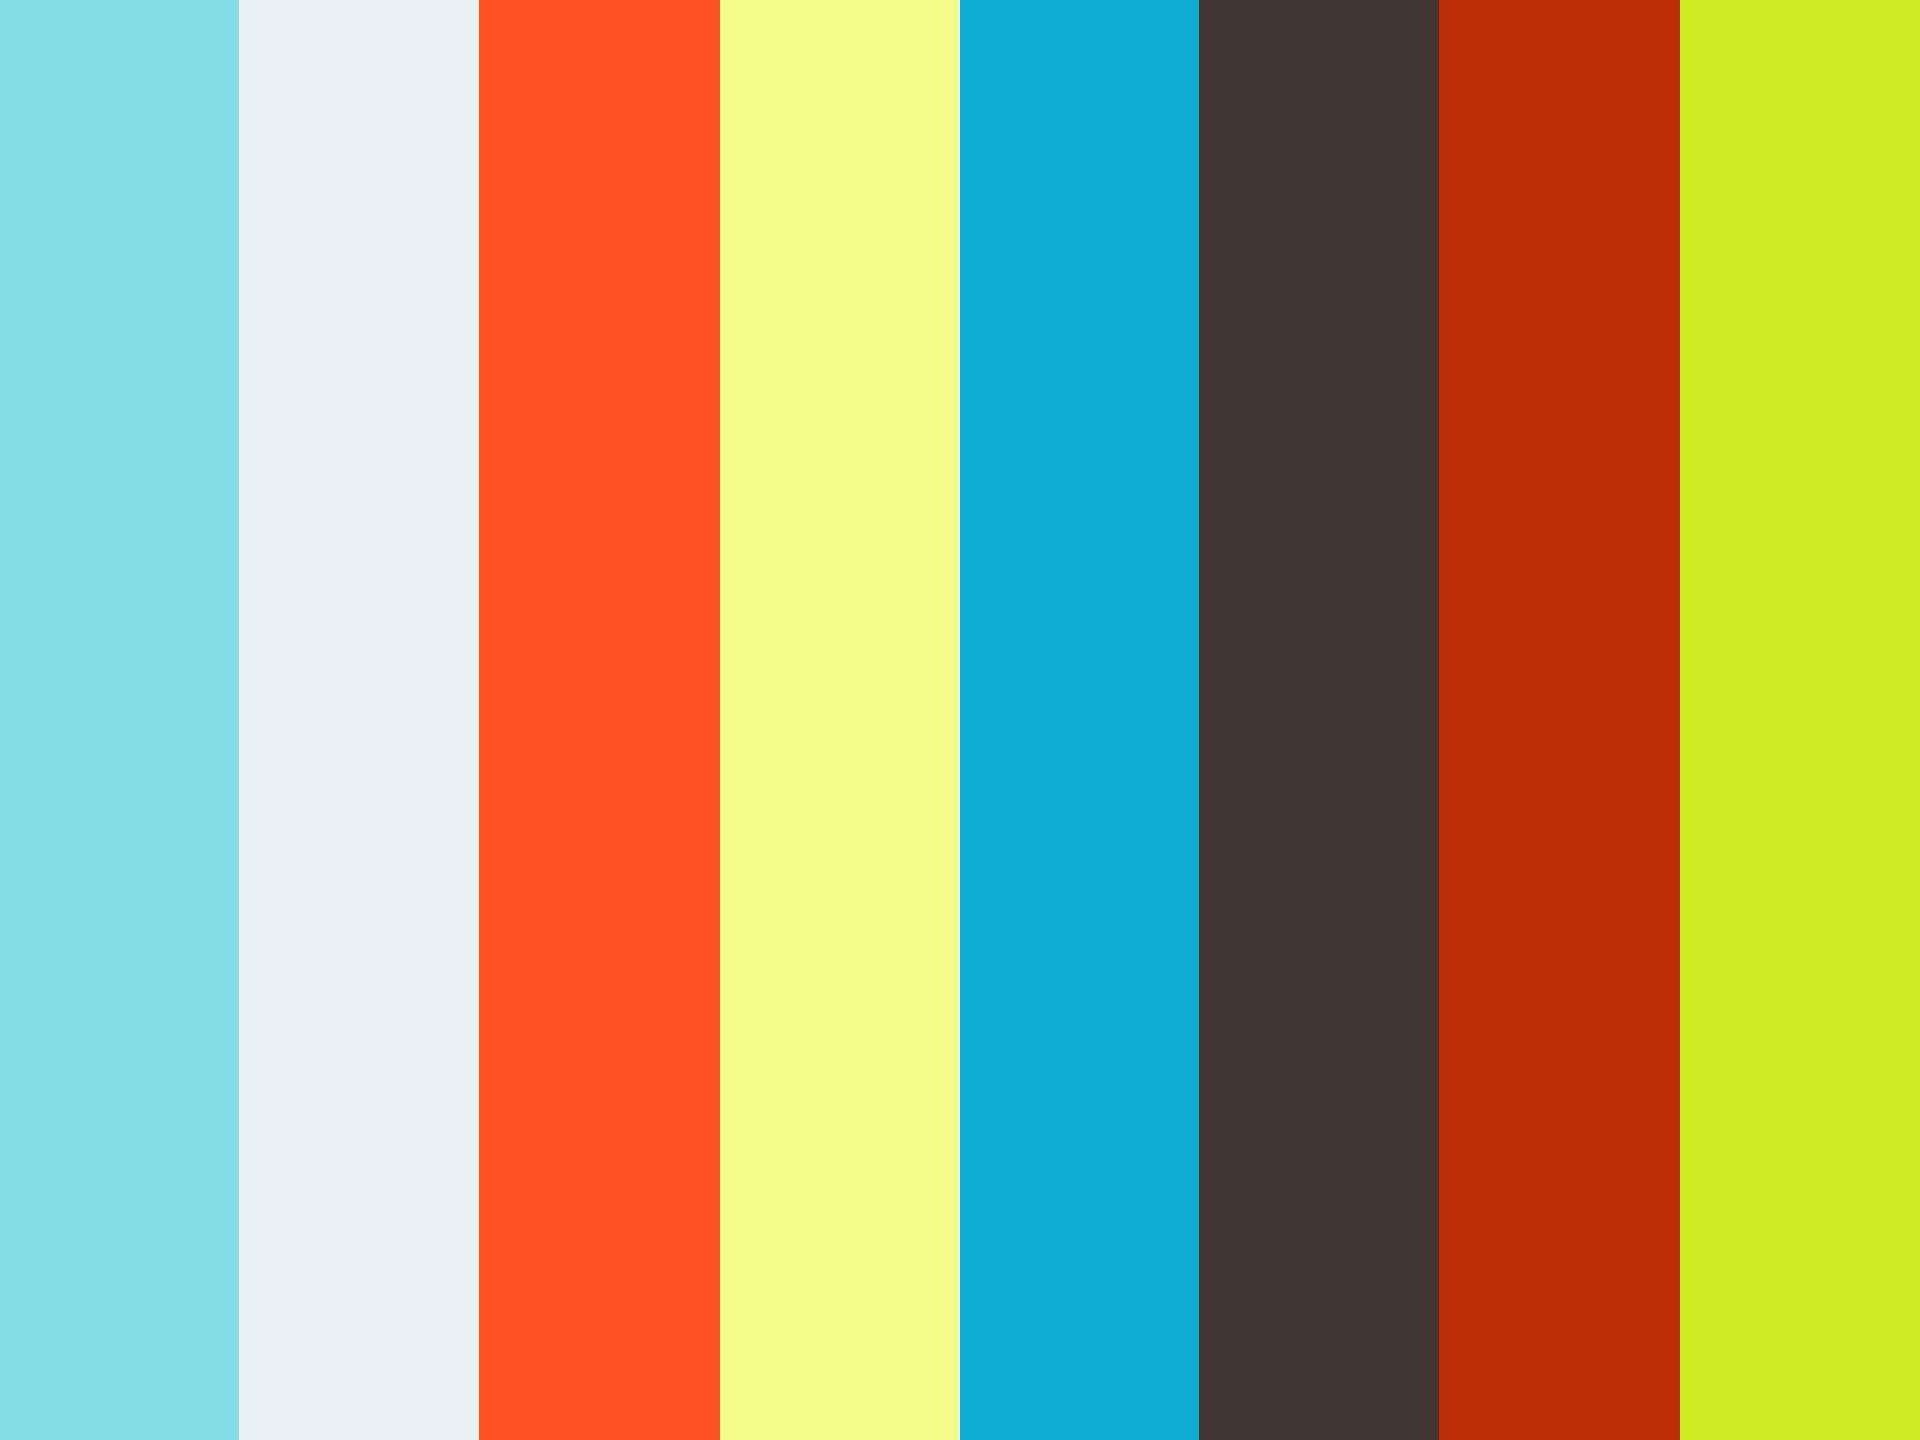 MERCEDES BENZ GTS - SILVER - 2016